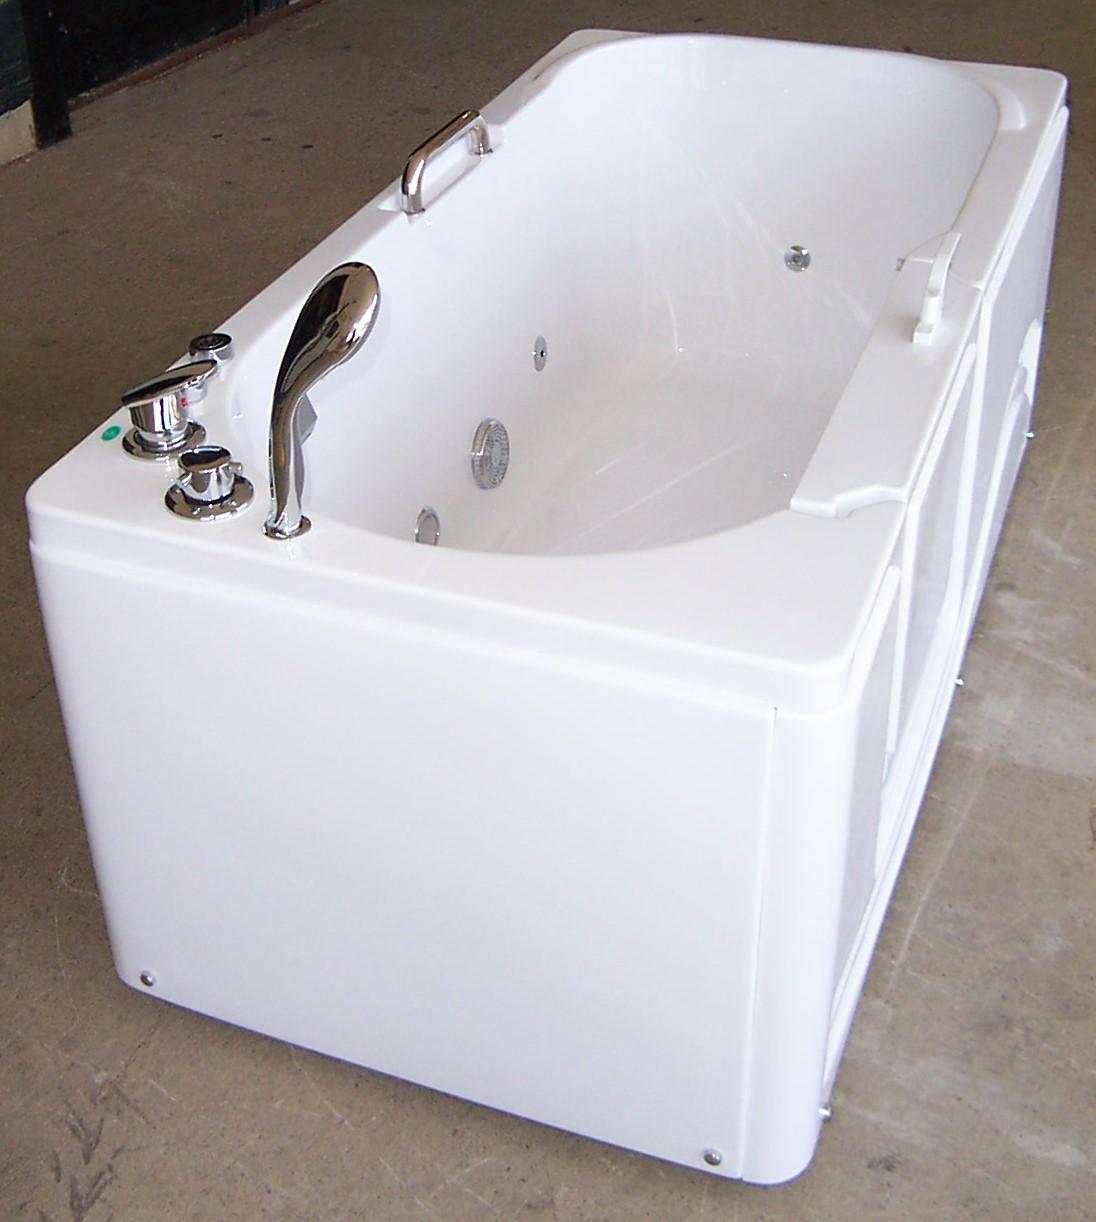 Luxury Spas And Whirlpool Bathtubs OW 9WO4 Walk In Tub